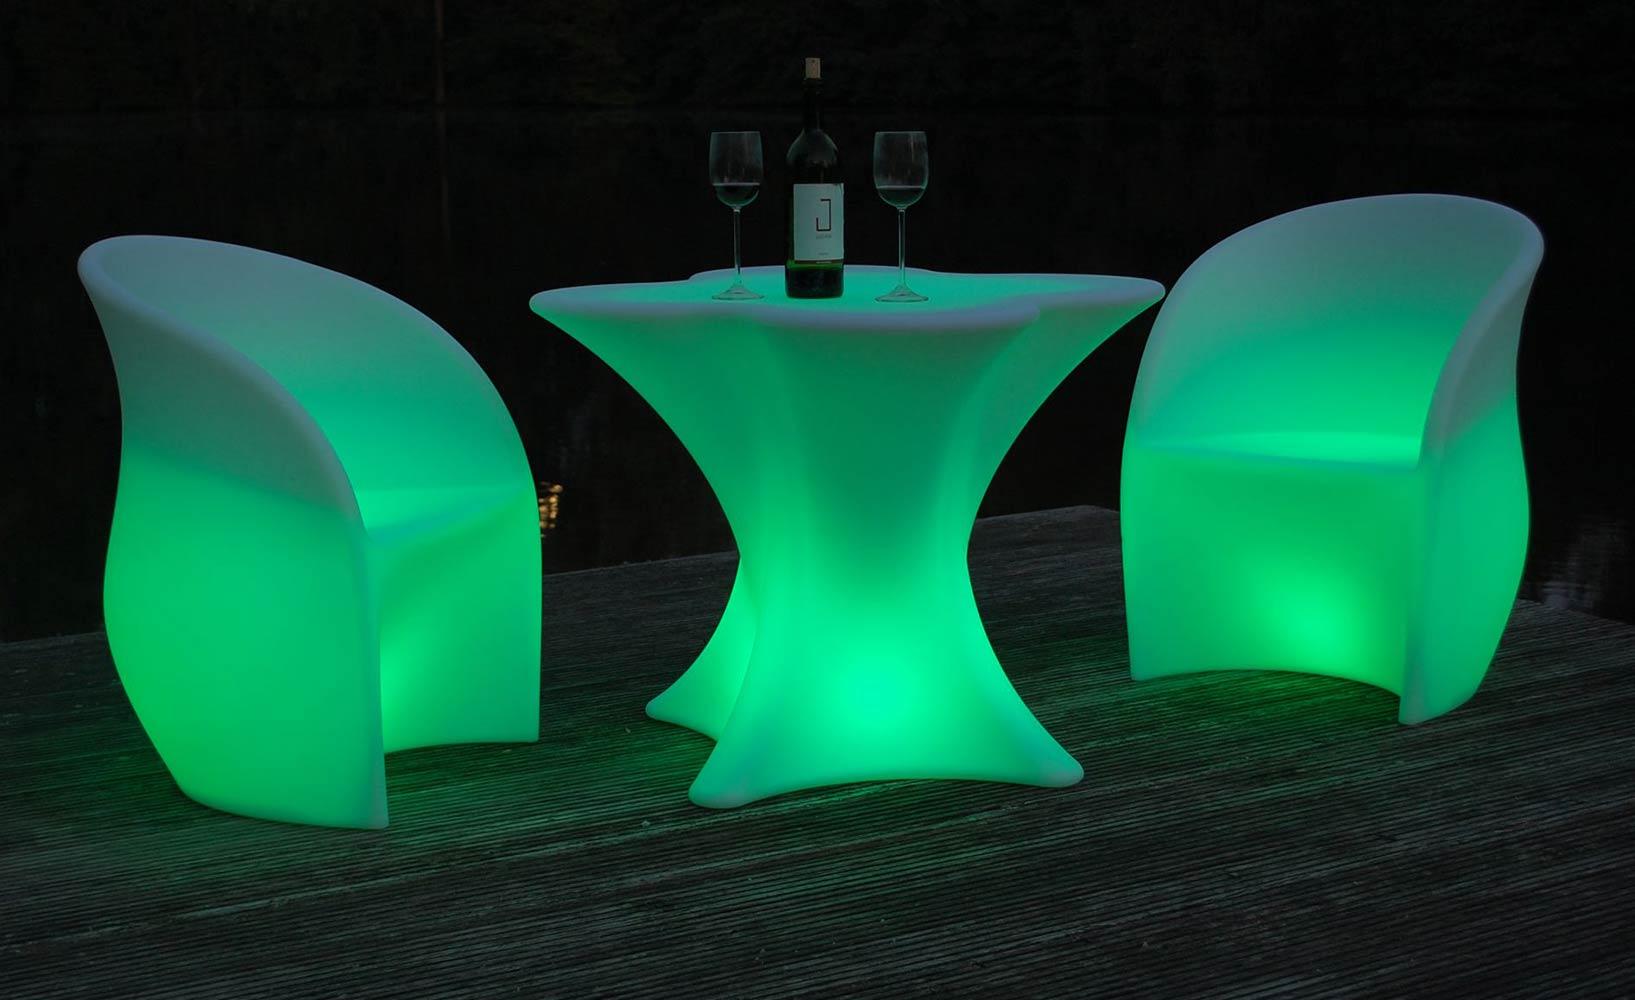 LED-Möbel für ultimative Wohlfühlatmosphäre